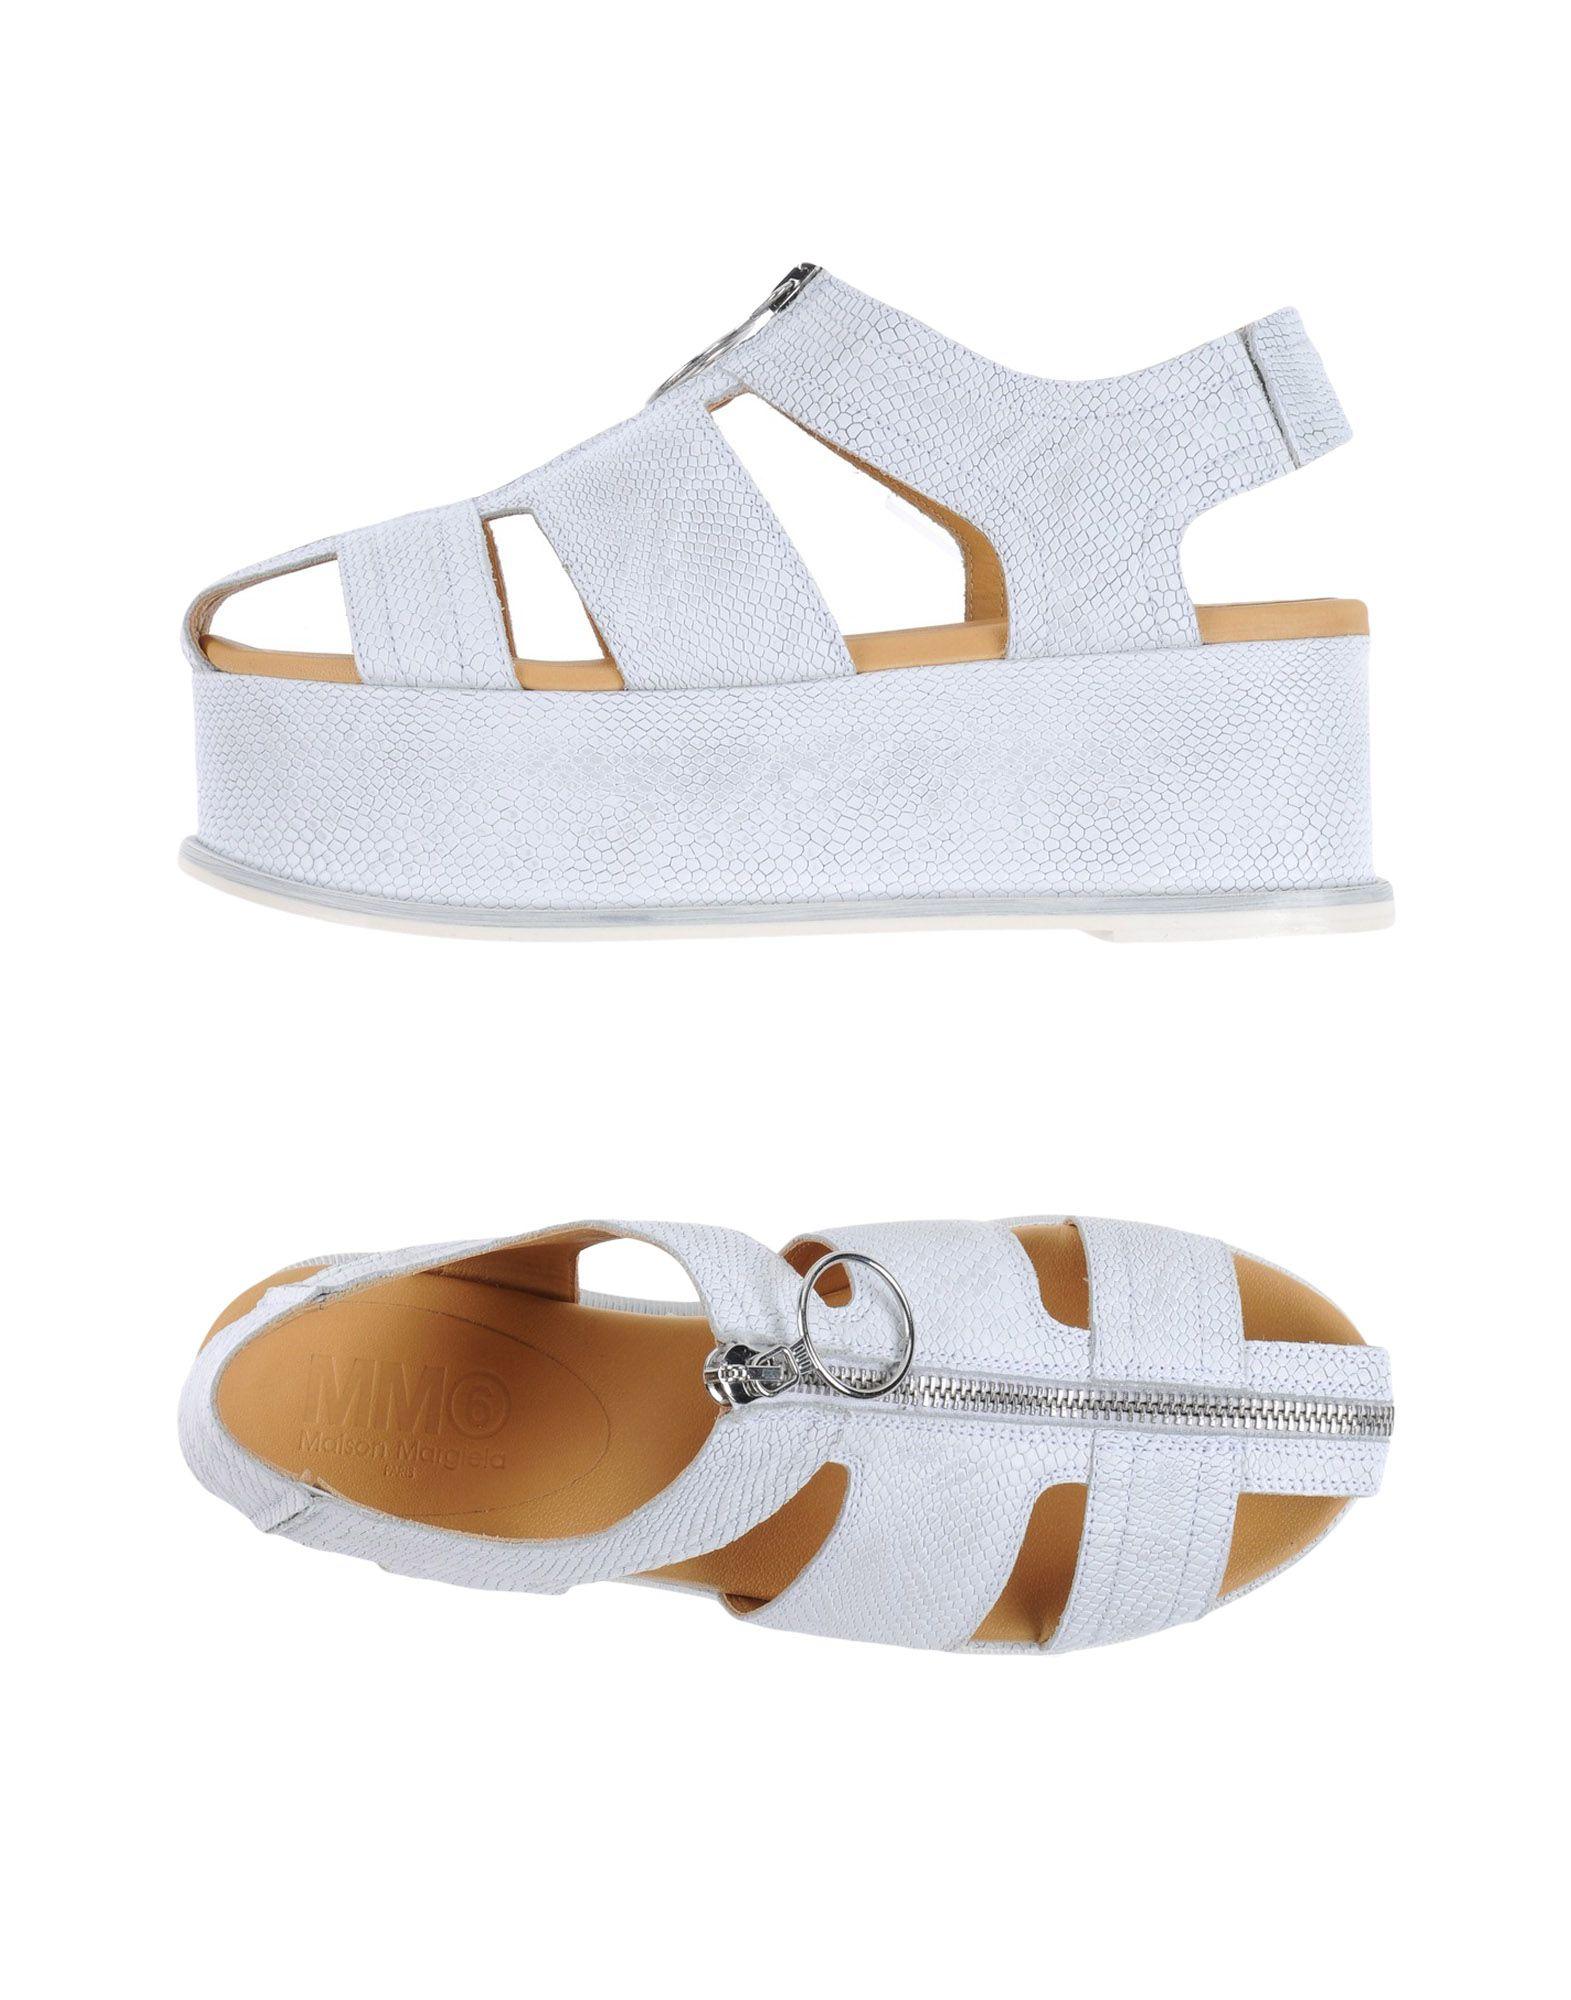 Mm6 Maison Margiela Sandals - - - Women Mm6 Maison Margiela Sandals online on  Canada - 11114946LD 0cdb44